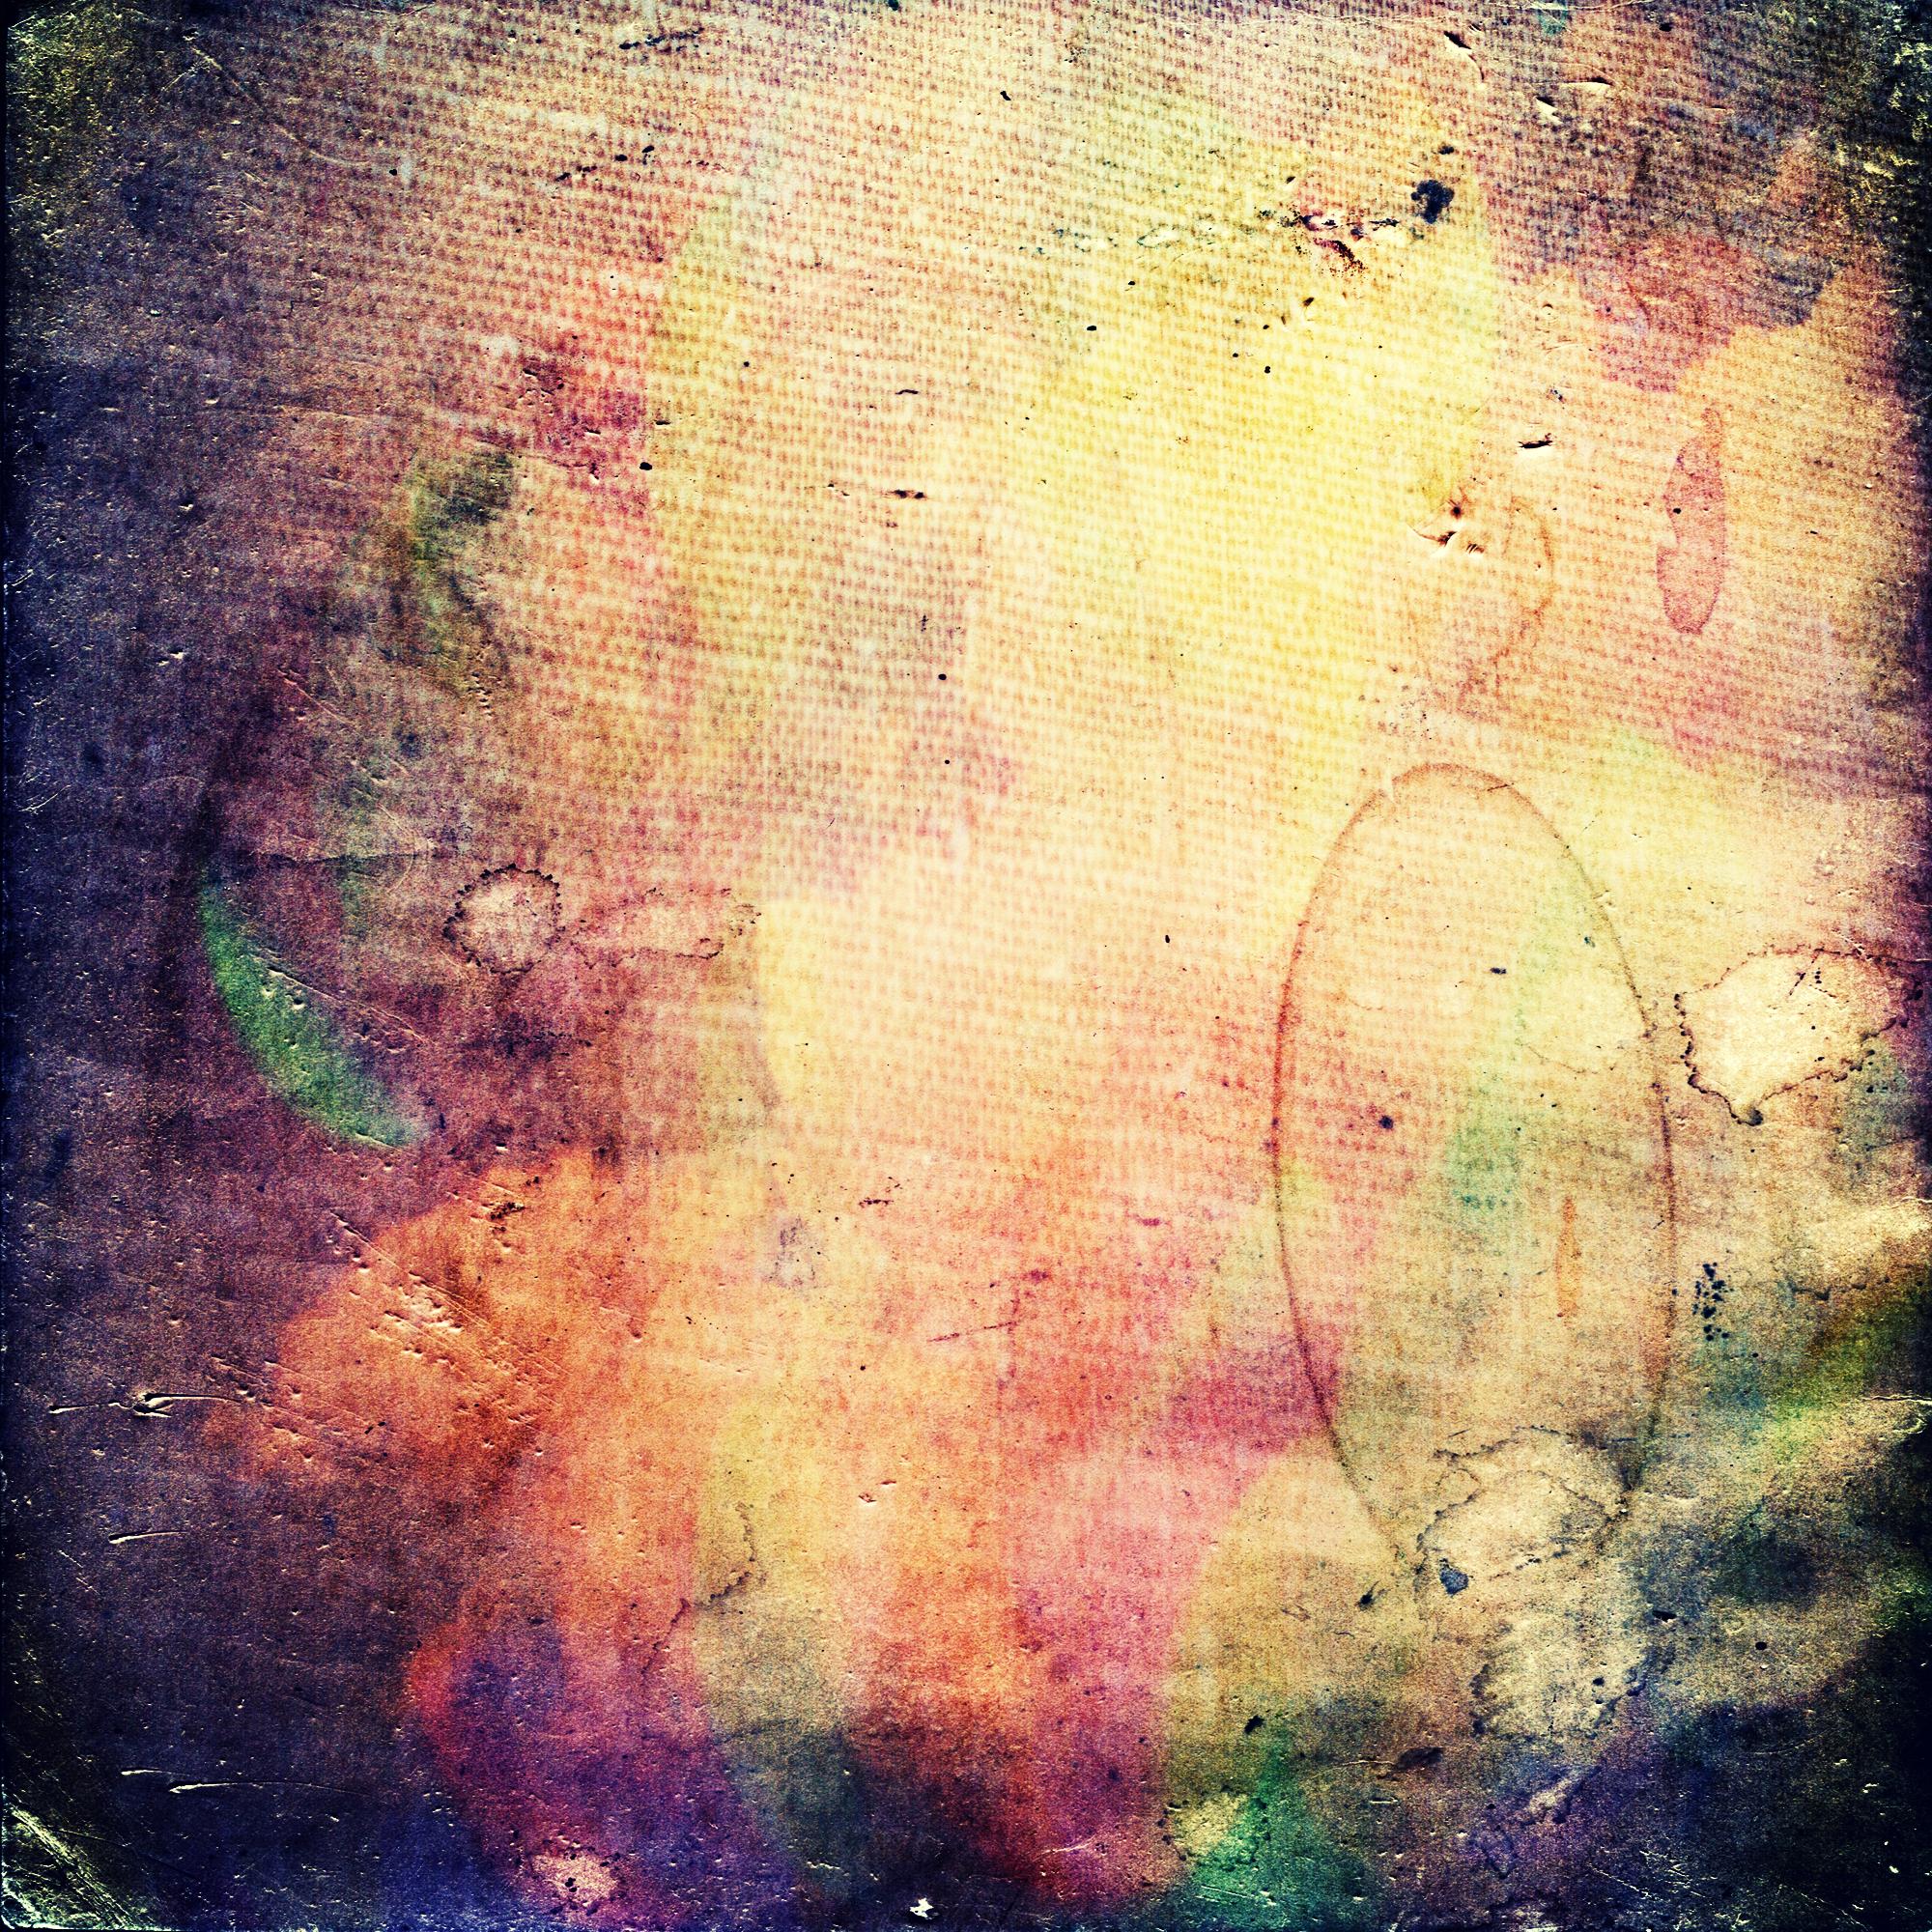 35 Bokeh Grunge Textures Photoshop Textures Patterns